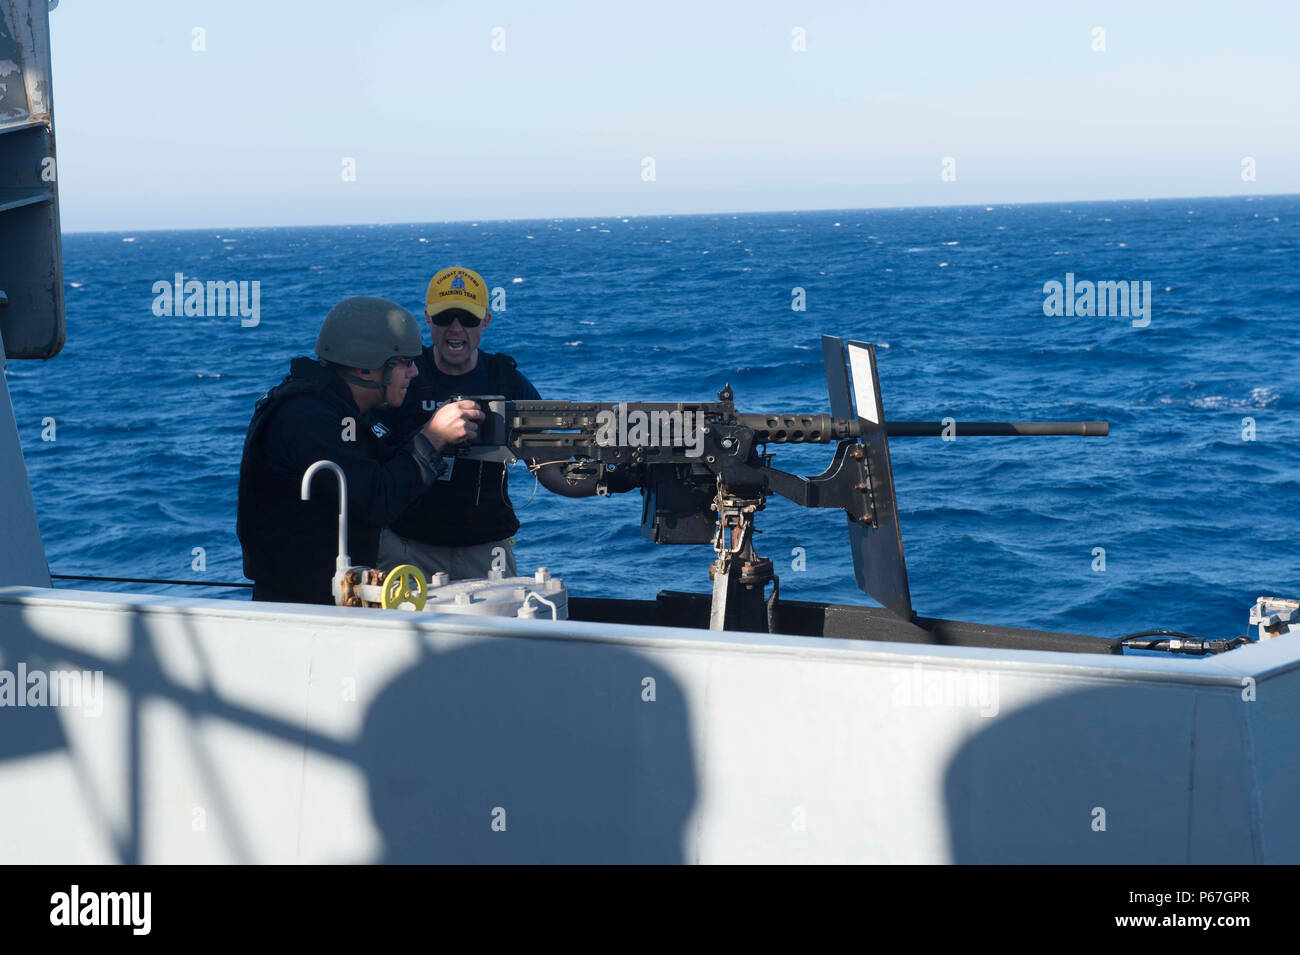 New Chief For Mediterranean Fleet Stock Photos & New Chief